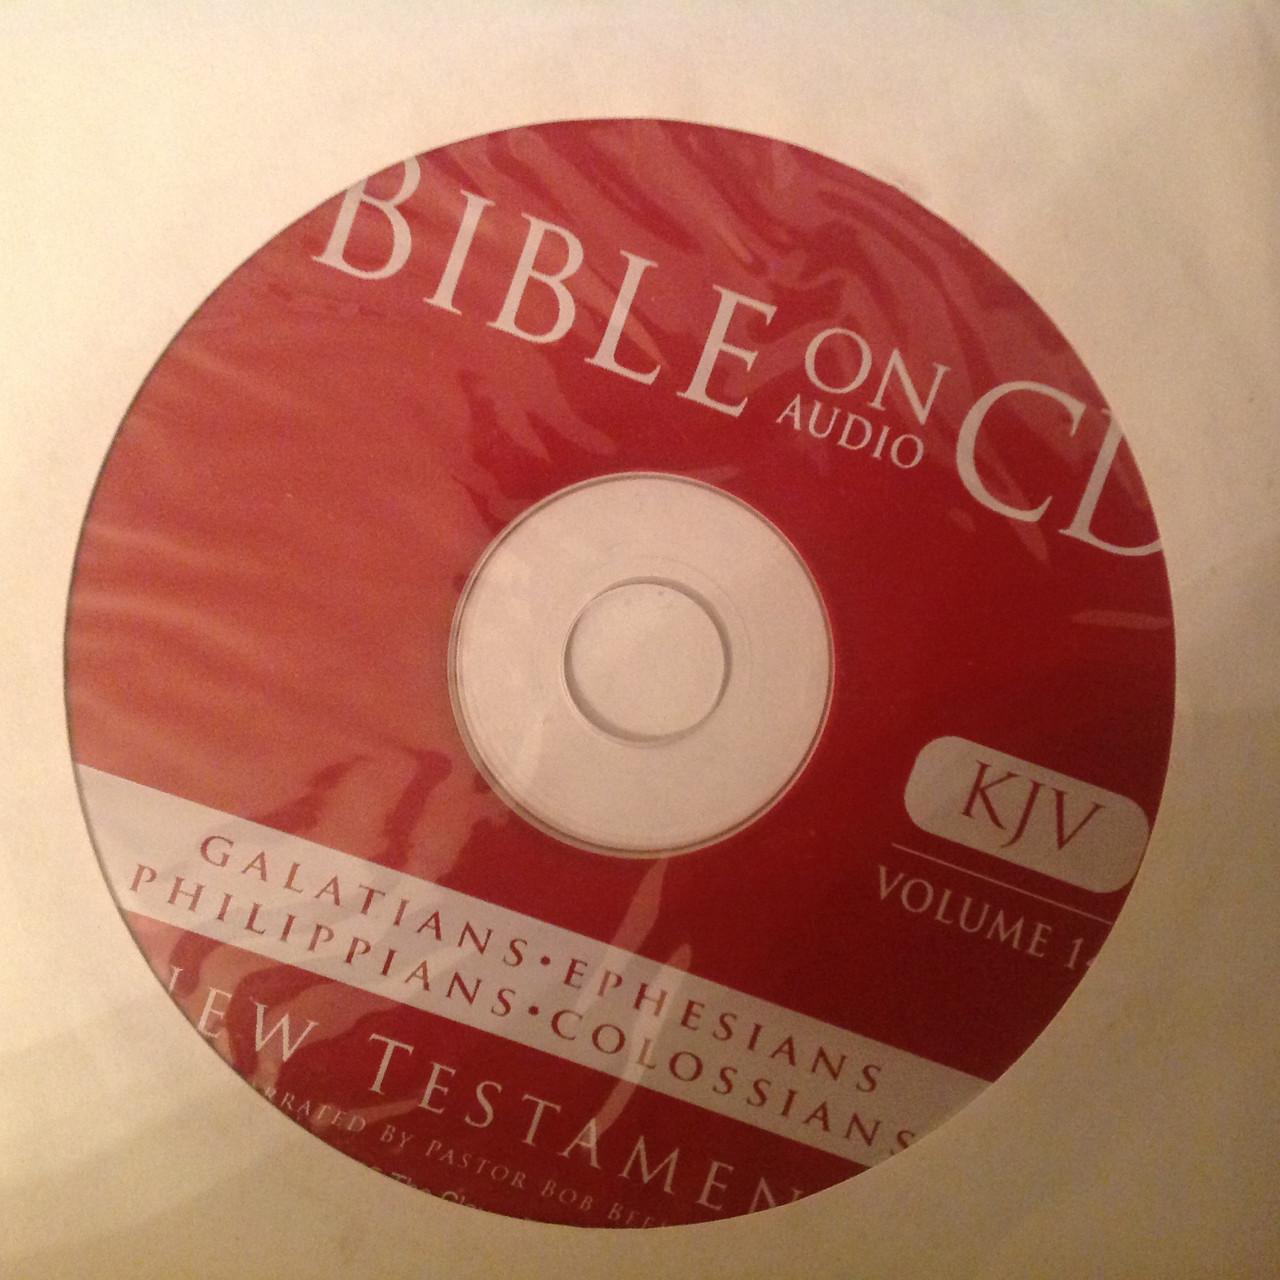 Bible on Audio CD, Vol. 14, Galatians, Ephesians, Philippians, Colossians CD